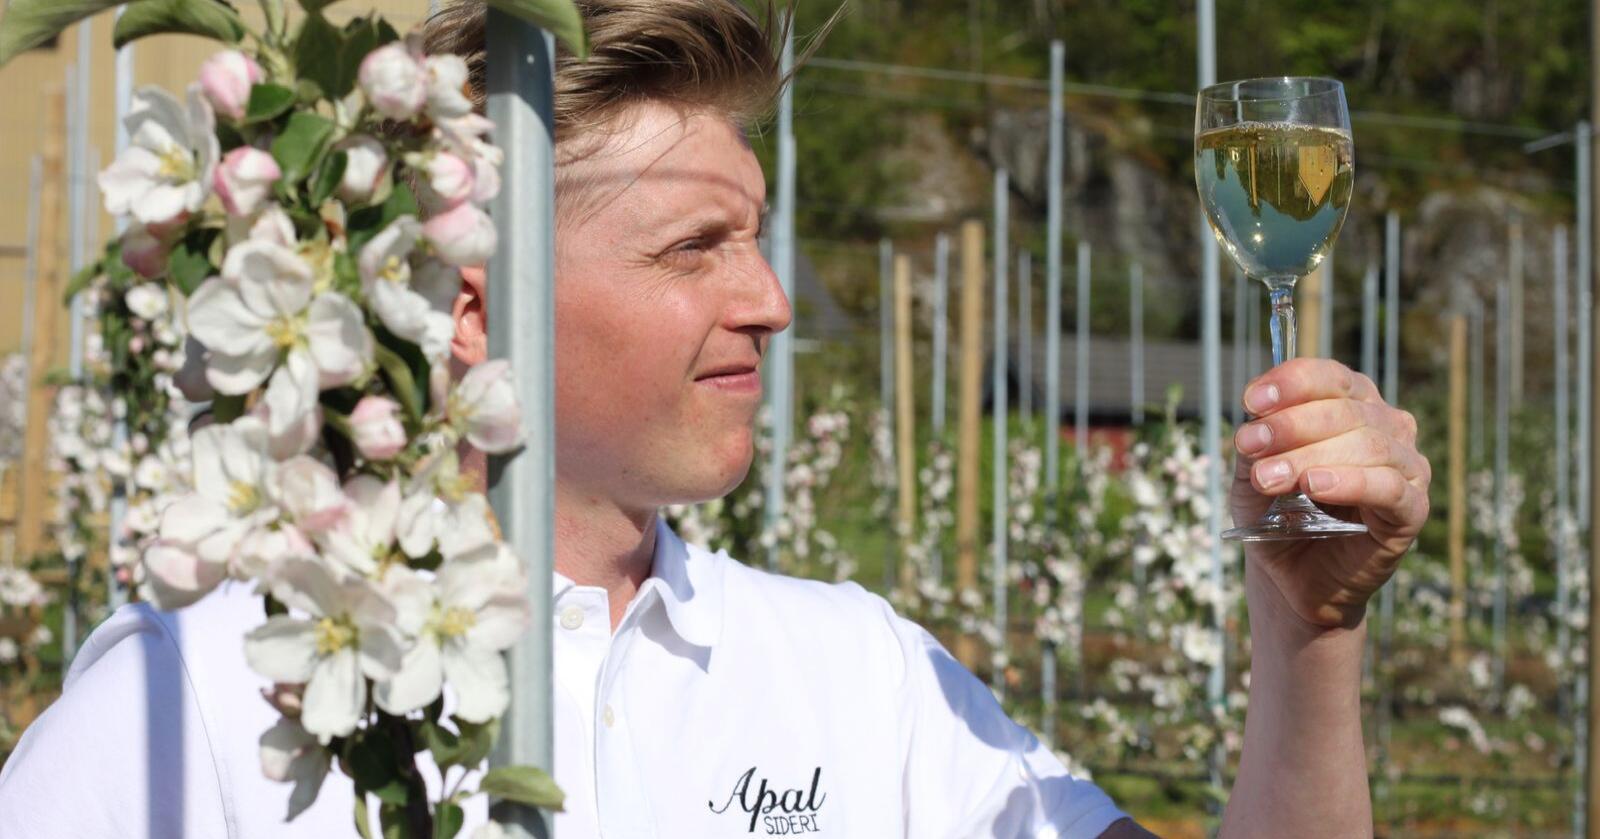 Vinner i kategorien musserende sider under Ciderworld 2020 ble 31 år gamle Dan Olav Sæbø med hans Sølvsider. Foto: Hanen